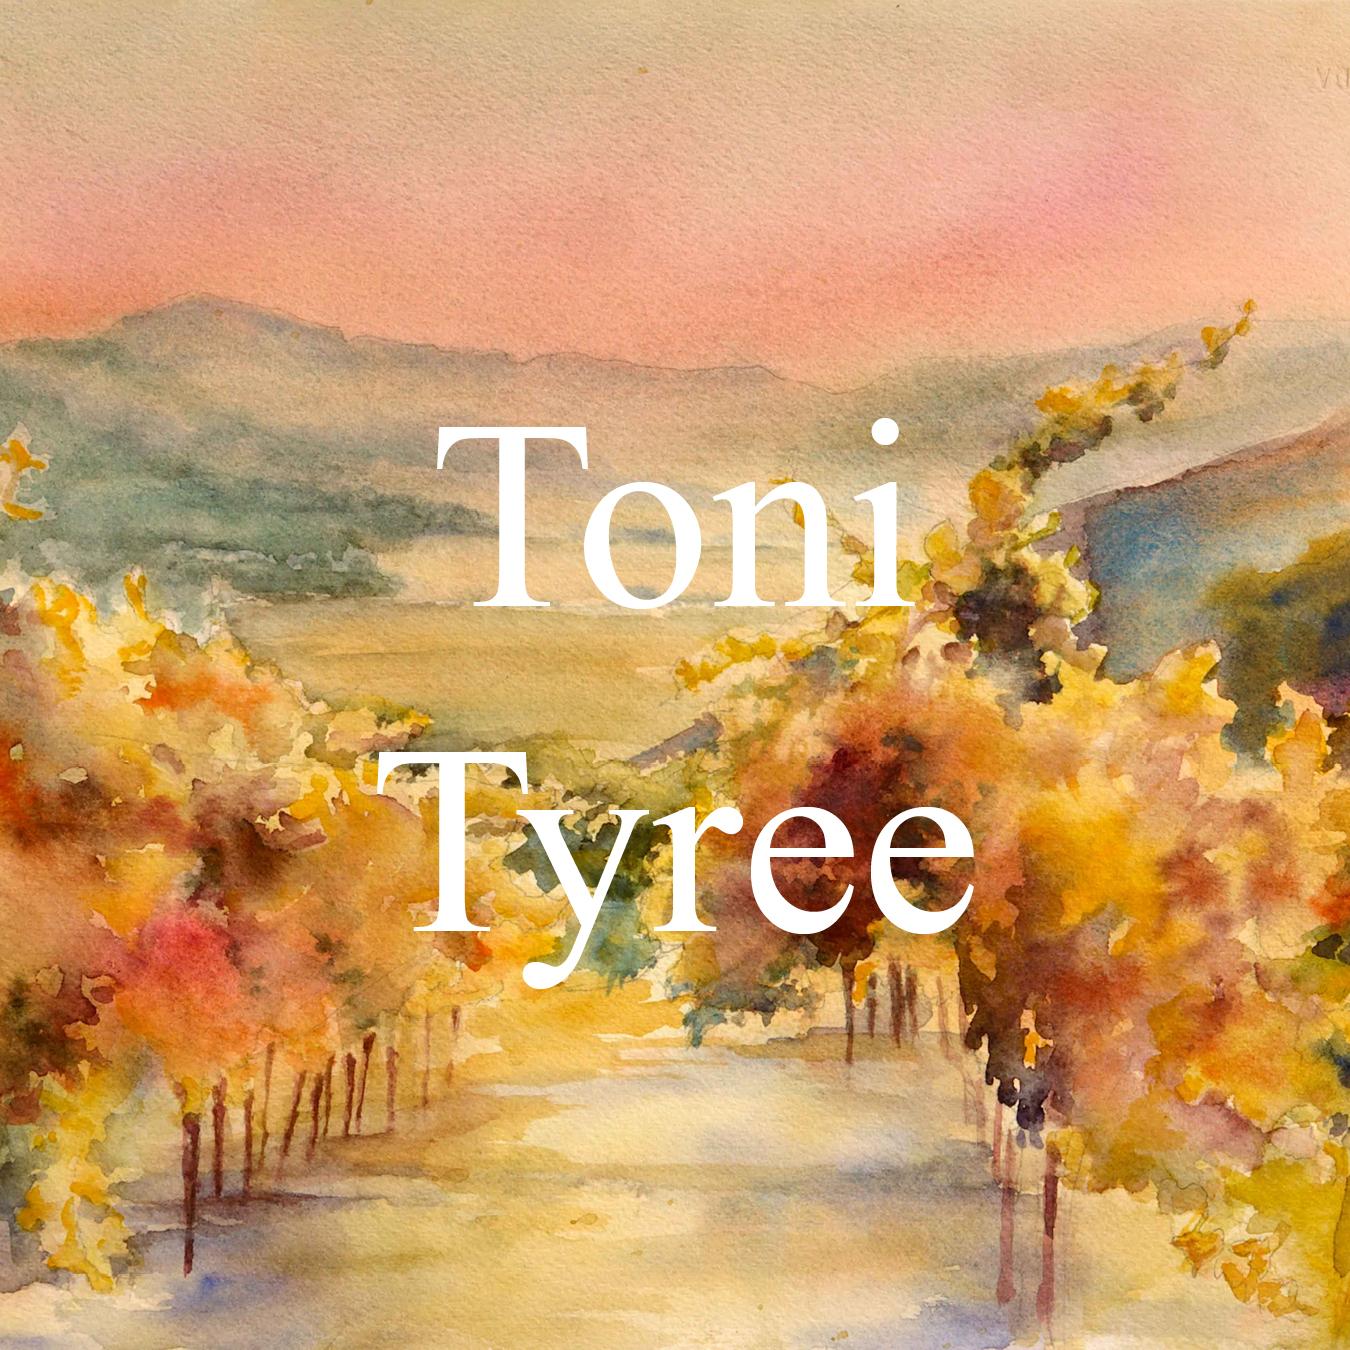 TyreeT (ArtByTown).jpg